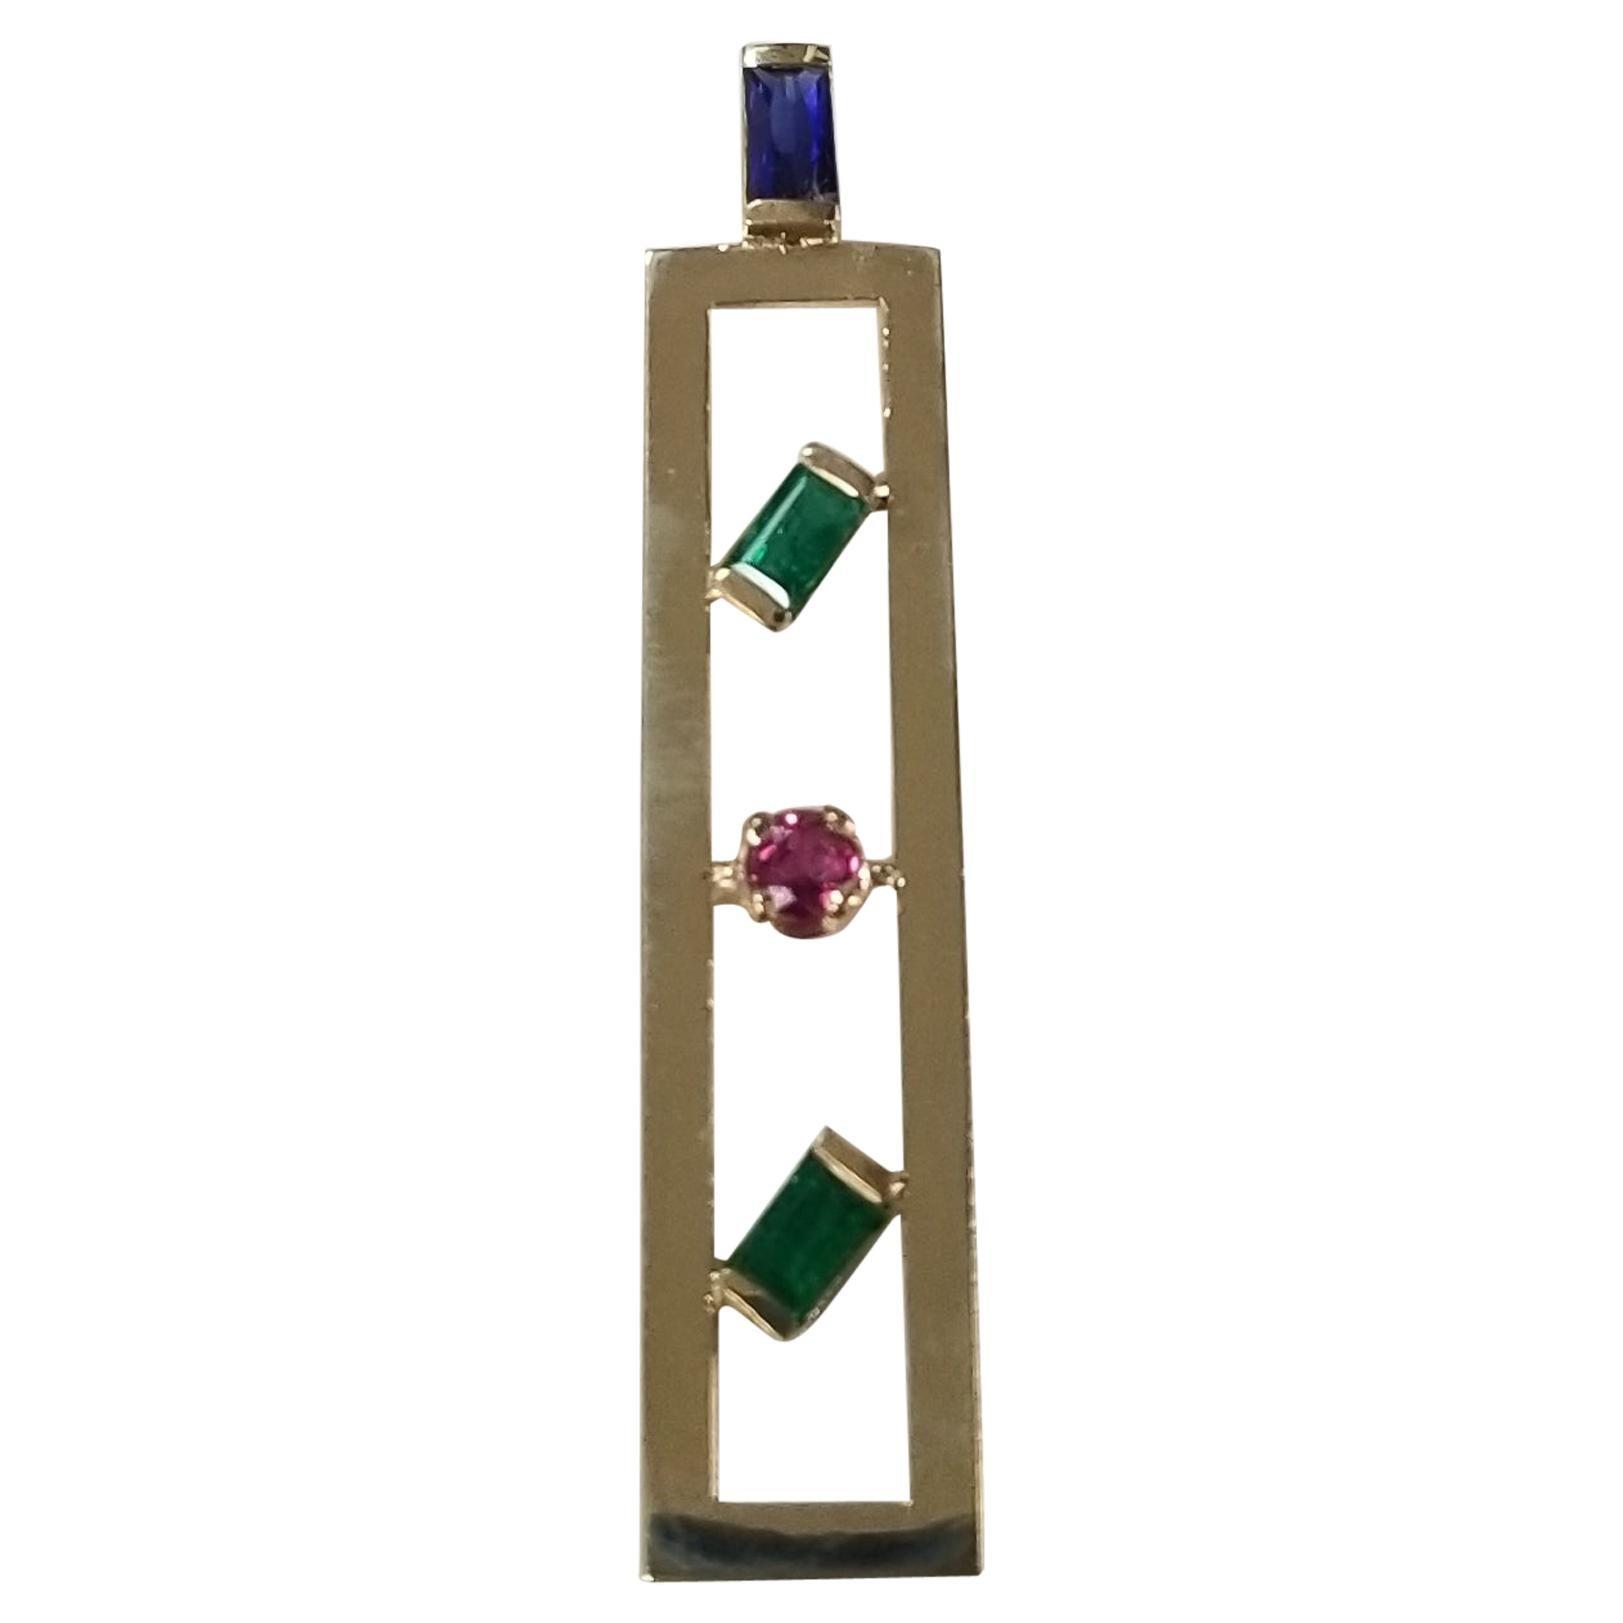 14 Karat Yellow Gold Multi-Color Gemstone Pendant